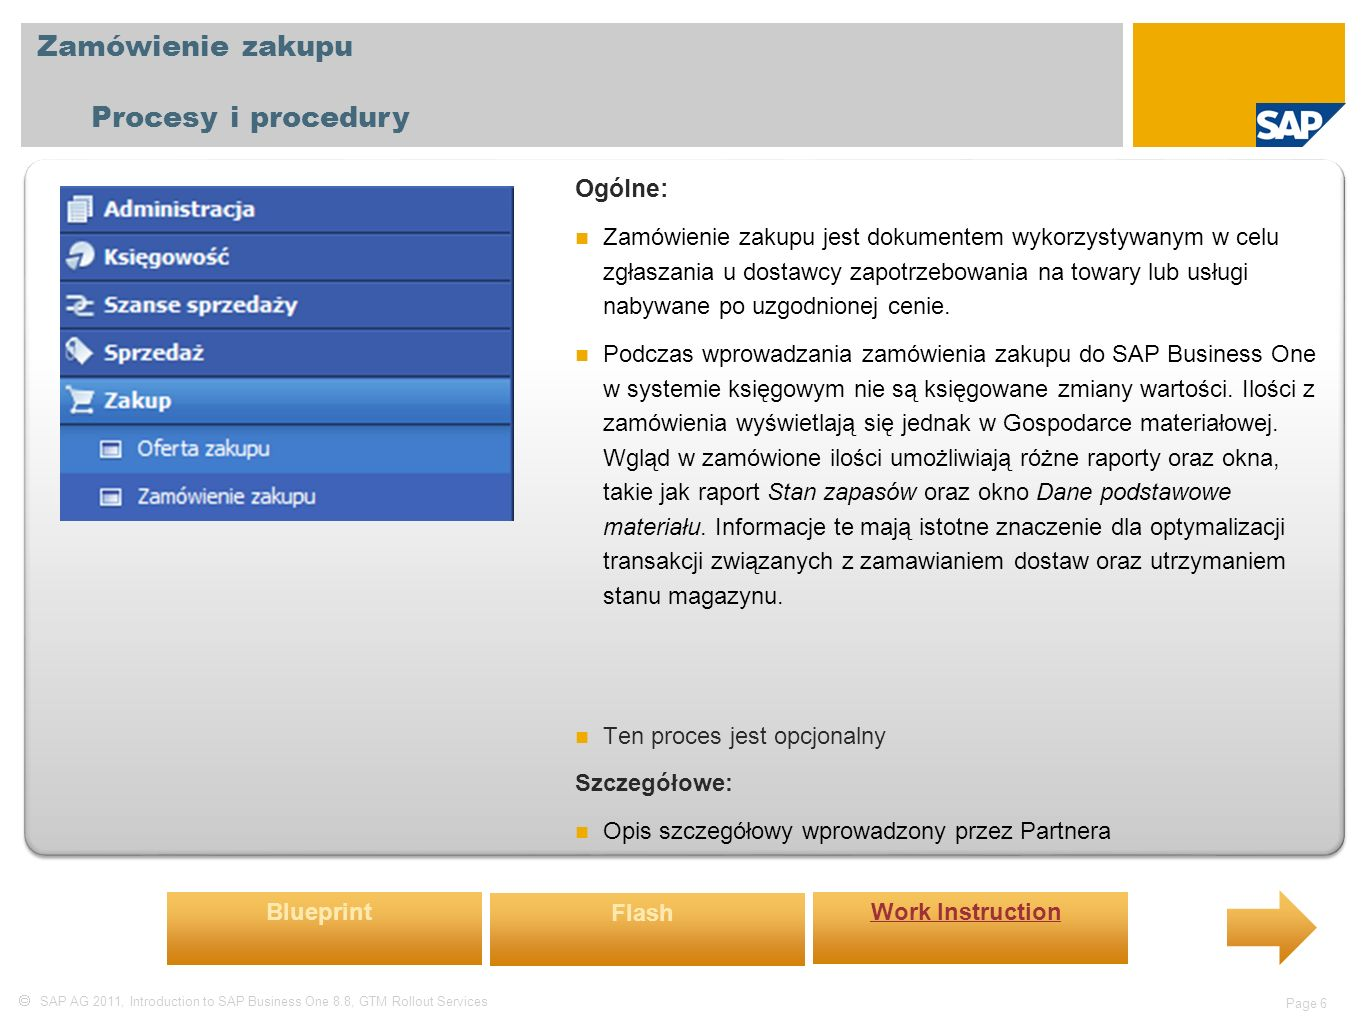  SAP AG 2011, Introduction to SAP Business One 8.8, GTM Rollout Services Page 6 Zamówienie zakupu Procesy i procedury Ogólne: Zamówienie zakupu jest